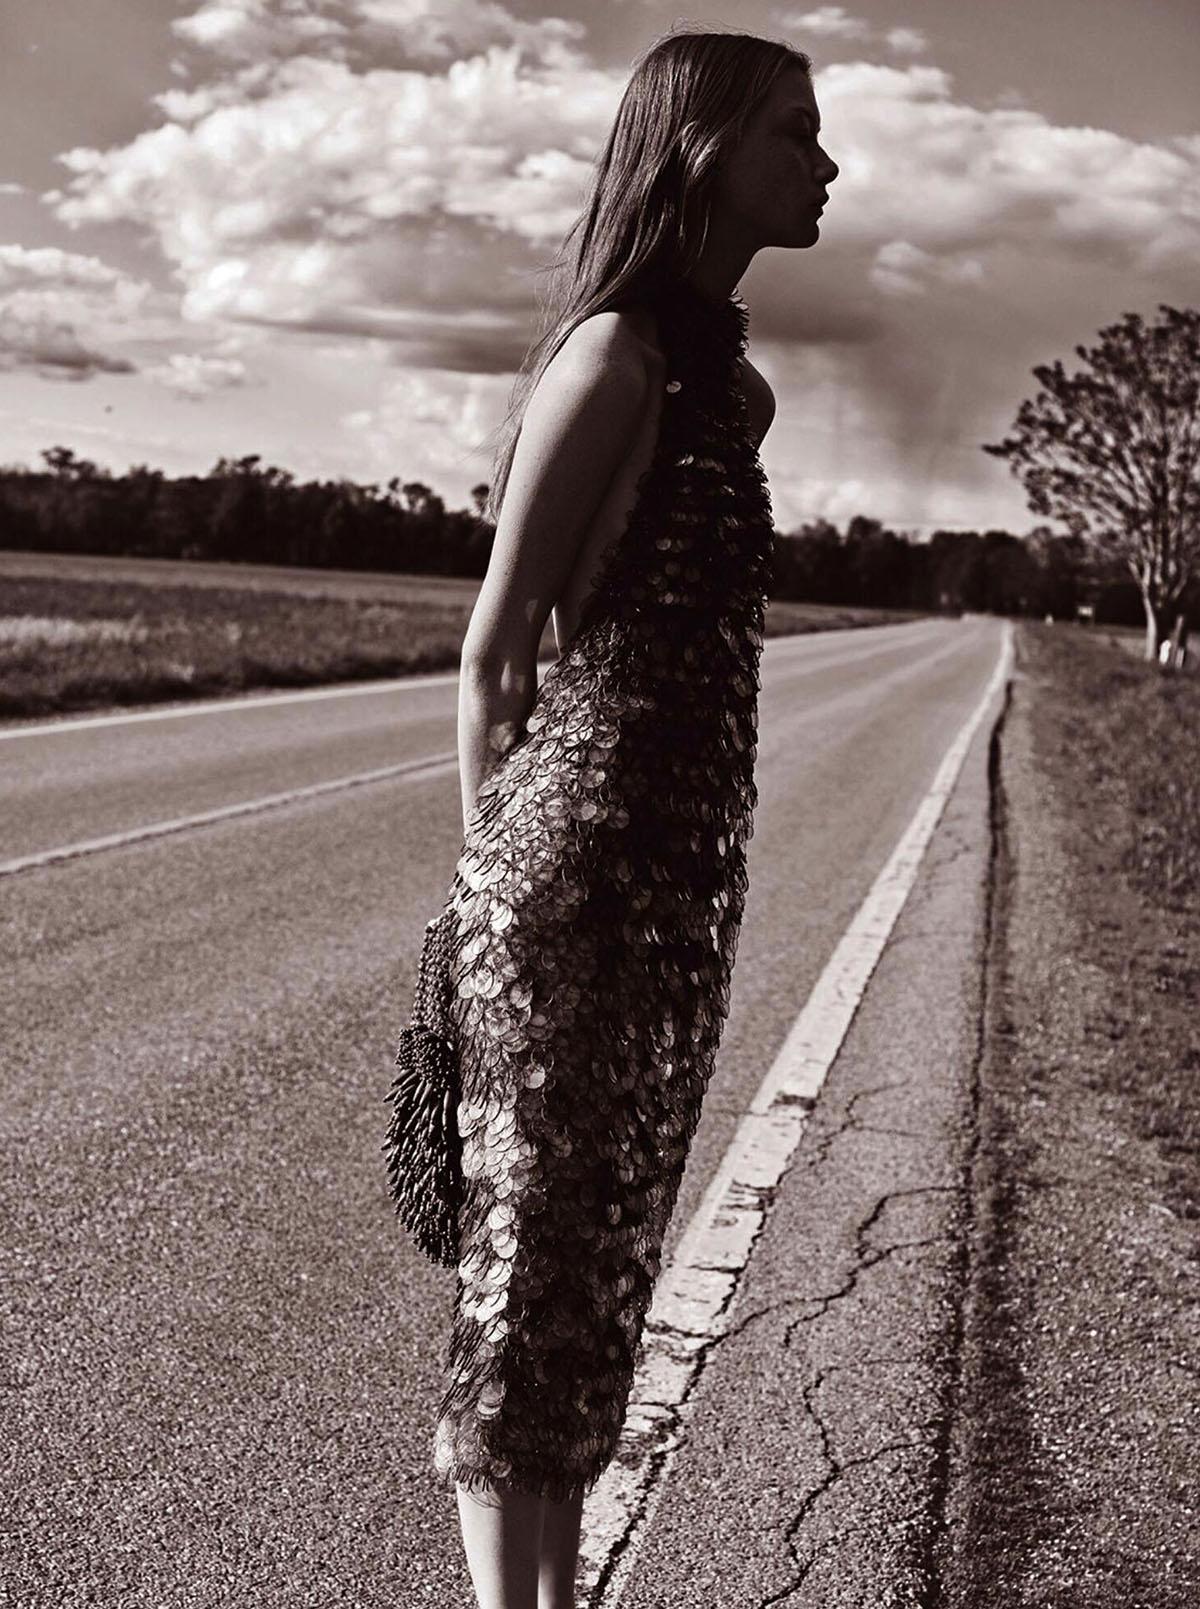 Sara Grace Wallerstedt by Geordie Wood for Vogue Australia July 2021